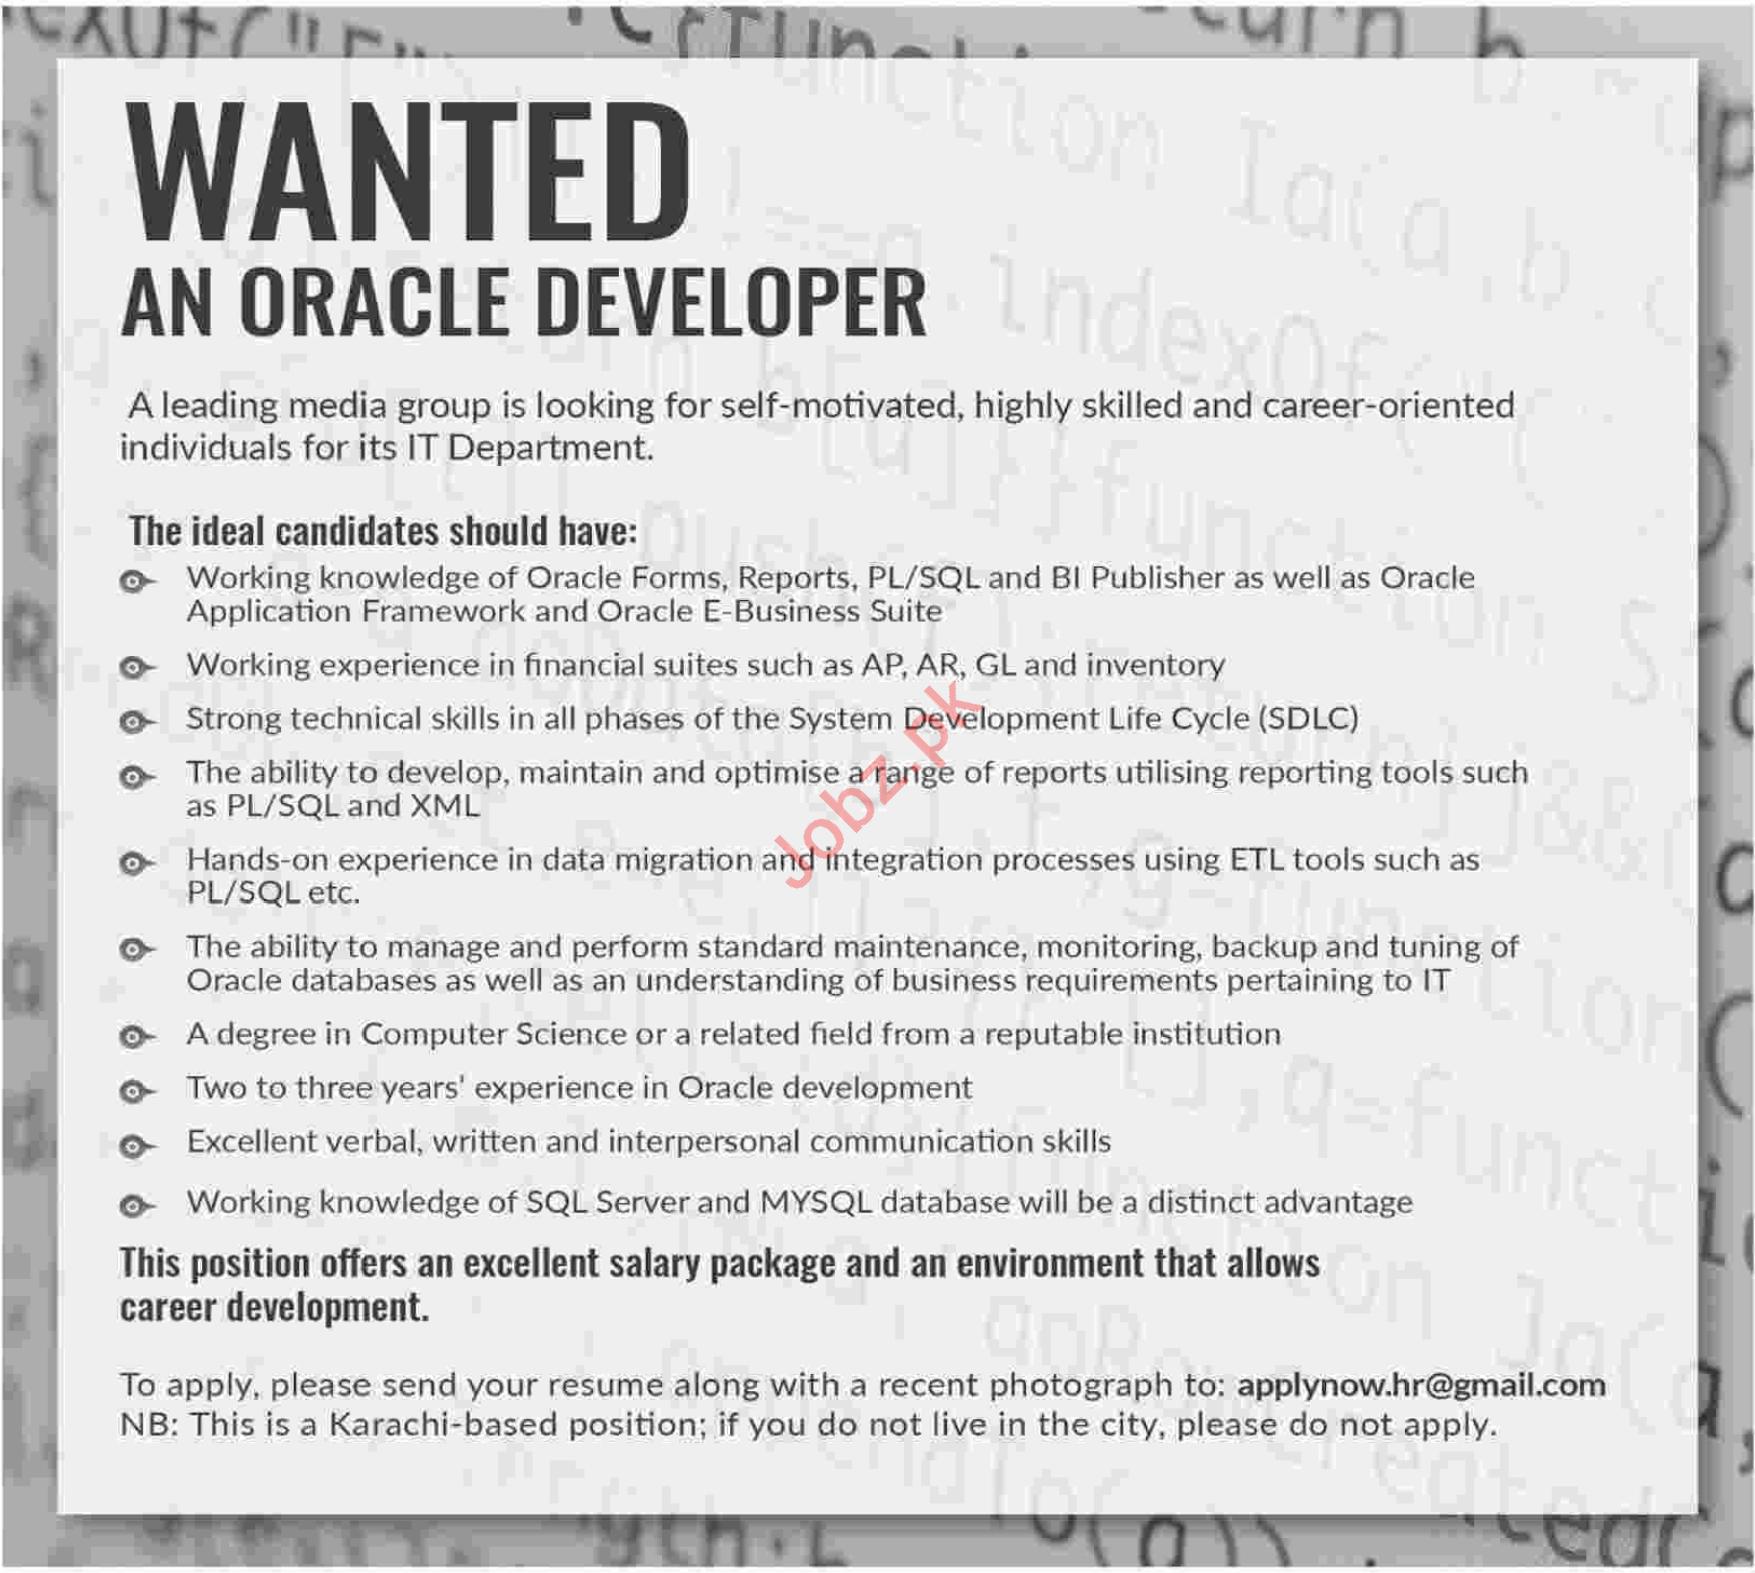 Oracle Developer for Media Group